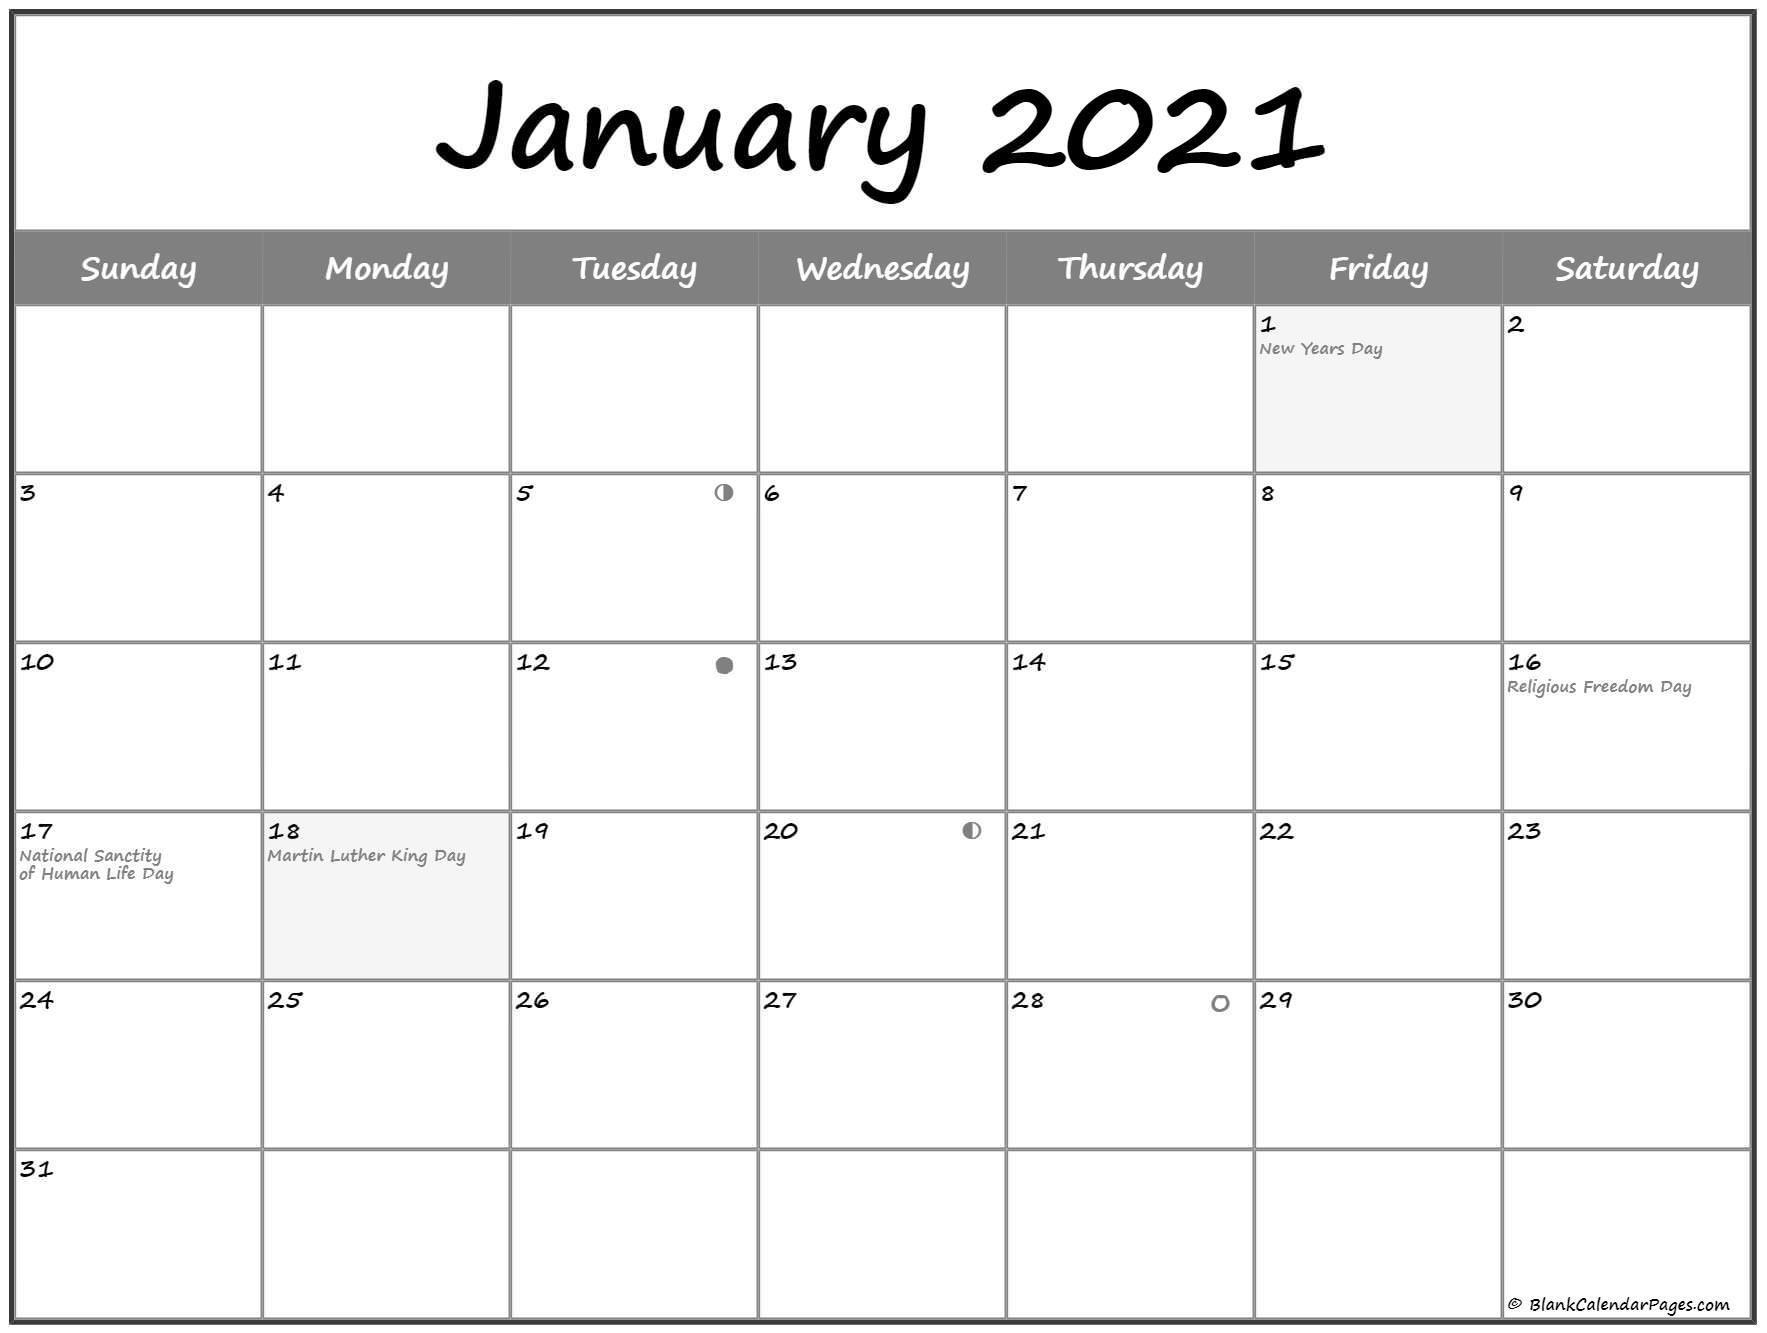 January 2021 Lunar Calendar   Moon Phase Calendar Inside Moon Calendar 2021 Name And Date For Kids